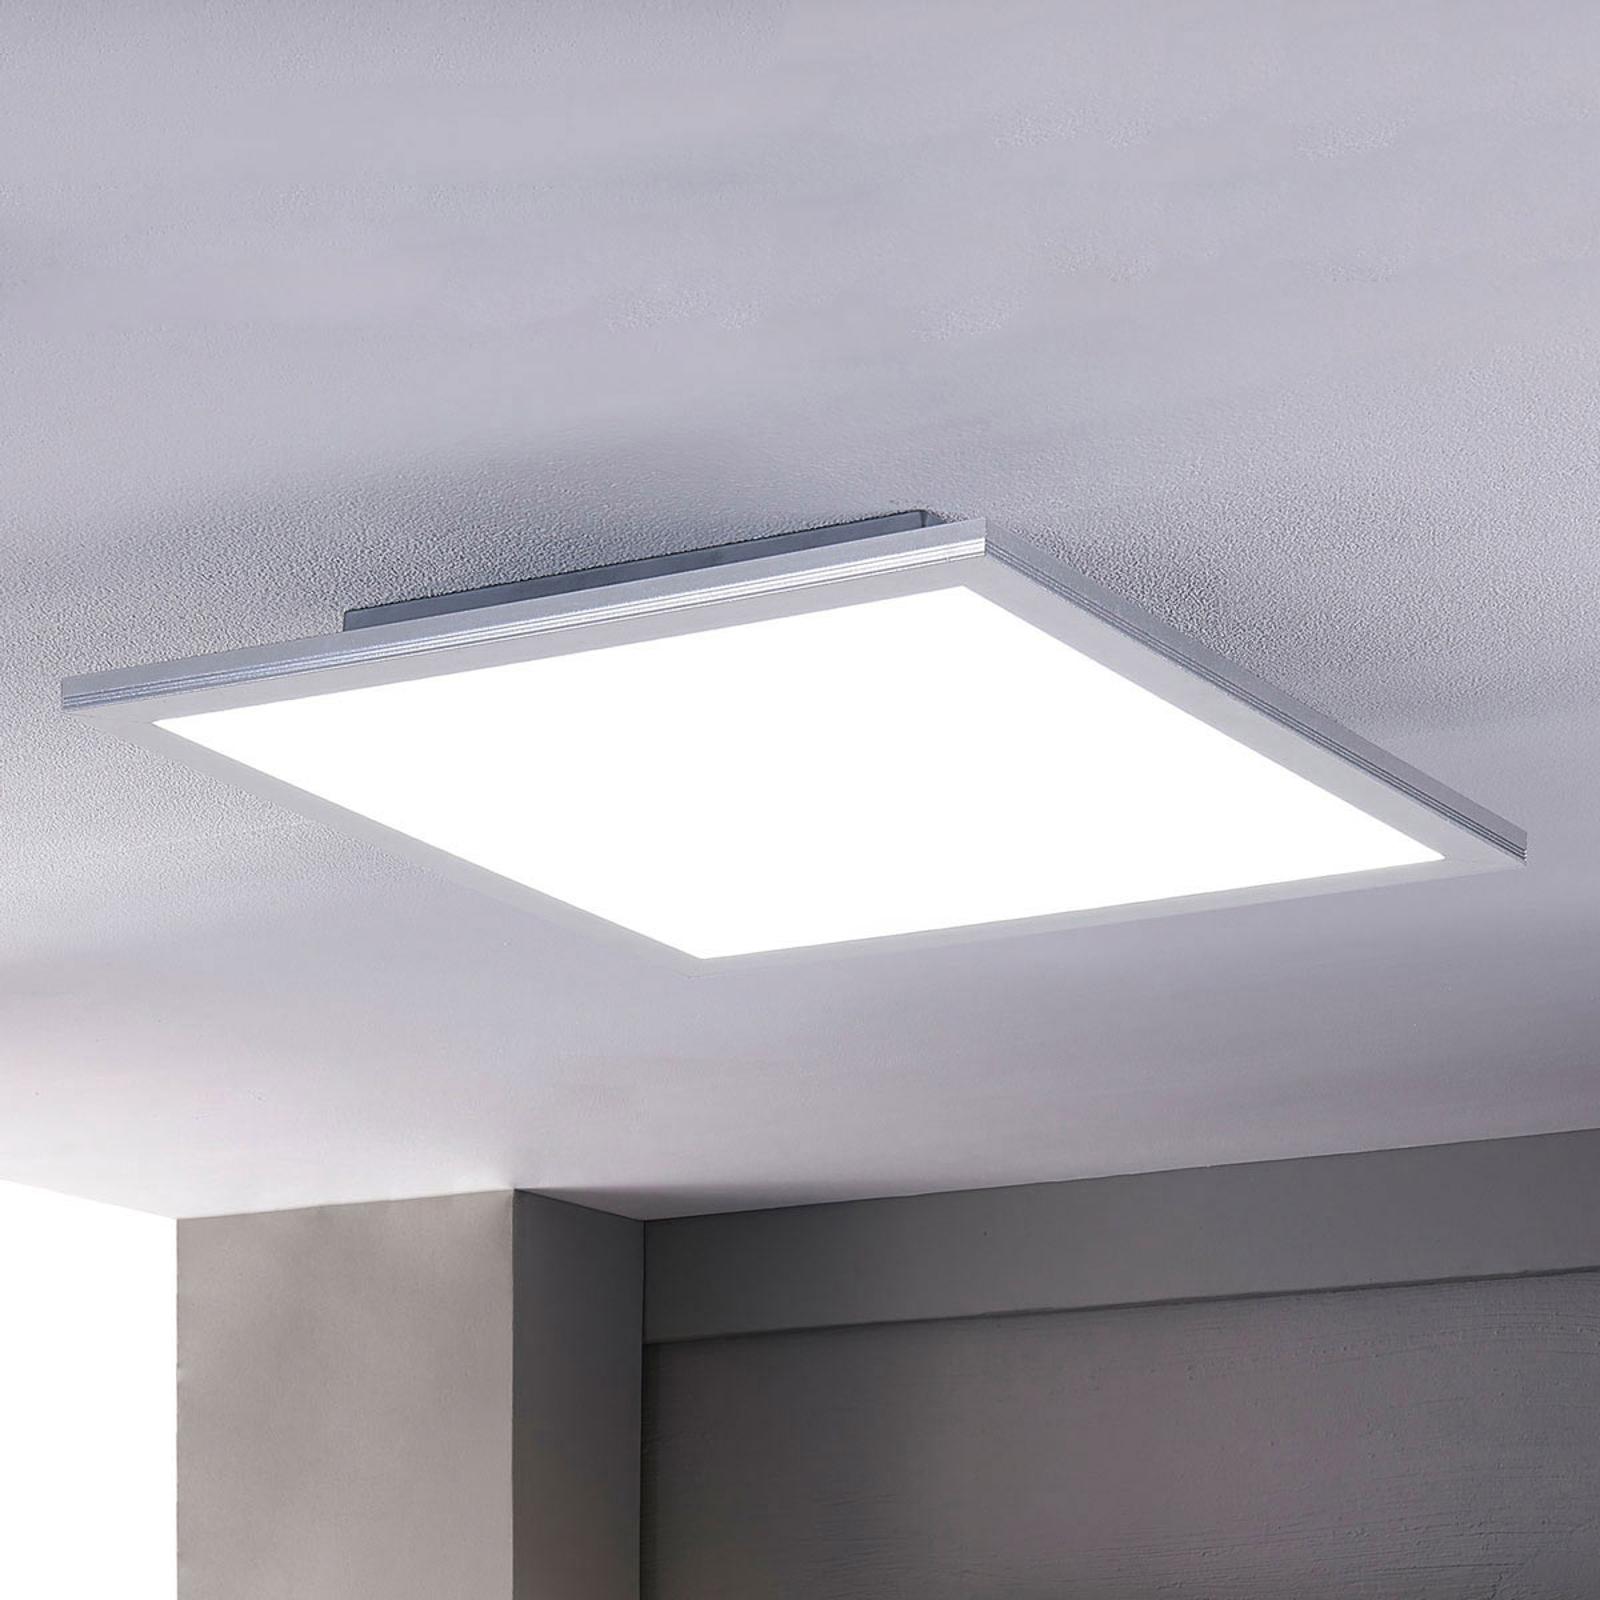 Lindby Livel LED paneel, CCT, 62 cm x 62 cm